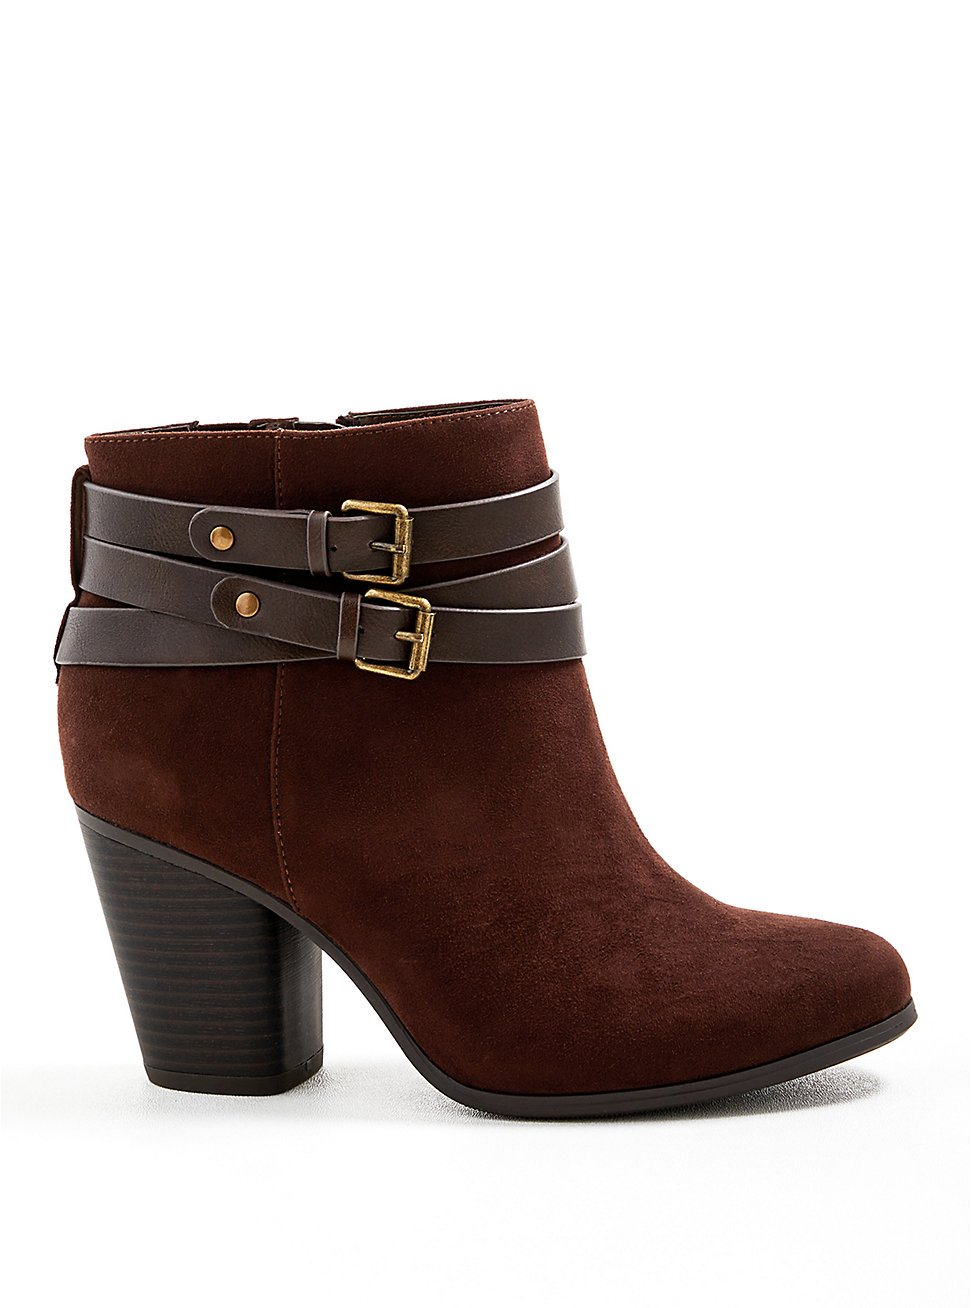 Plus Size Buckle Heel Bootie - Brown Faux Suede  (WW), BROWN, hi-res